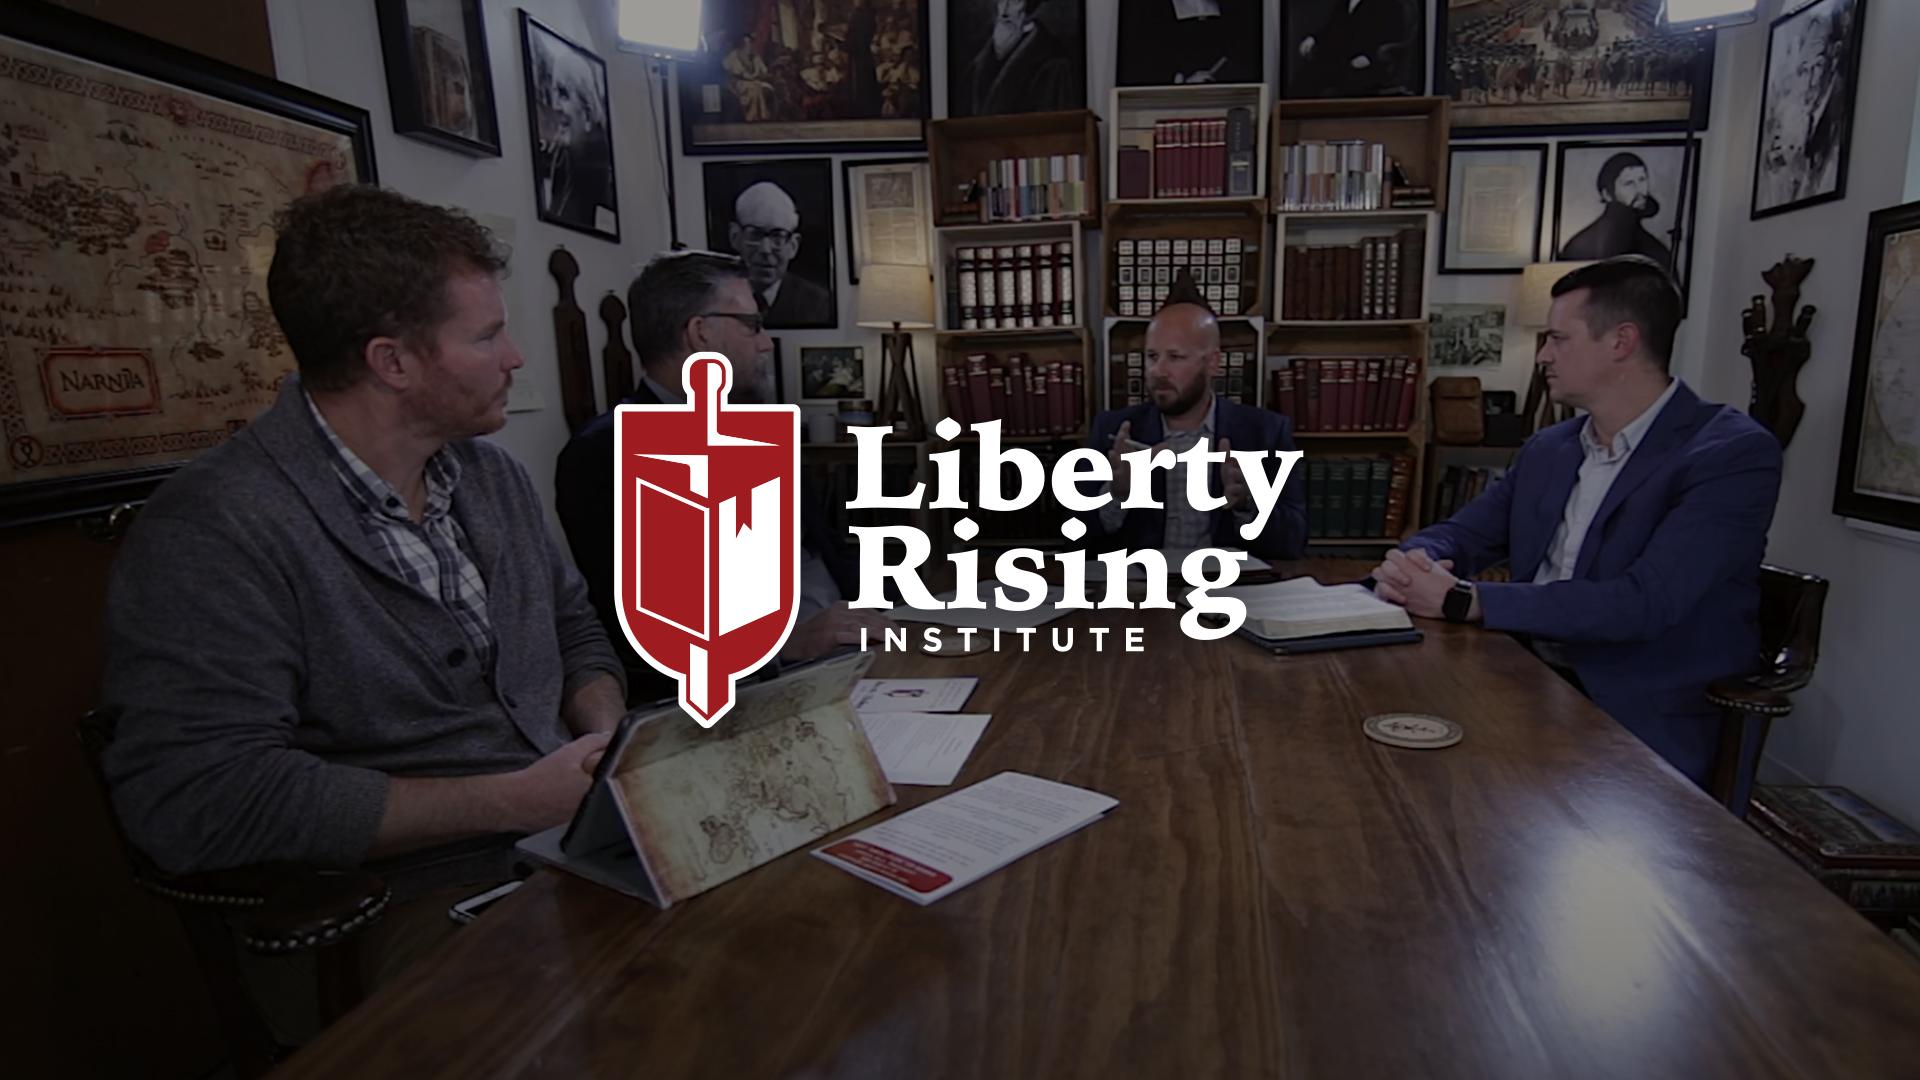 Liberty Rising Institute